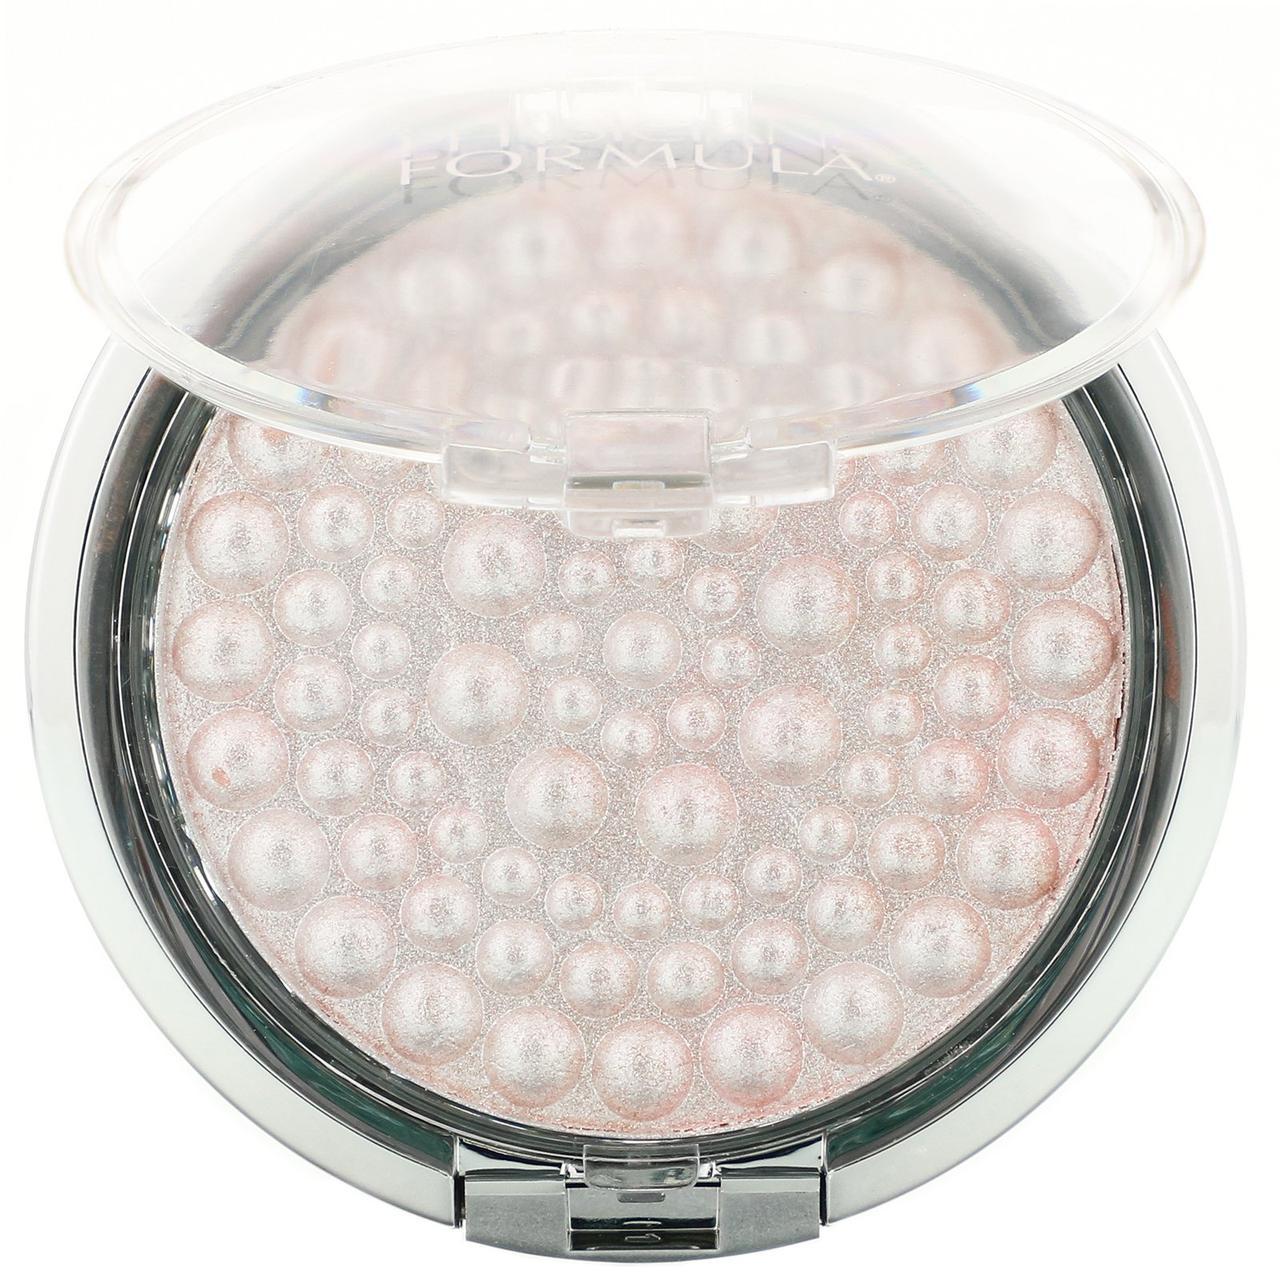 Пудра-бронзер Physicians Formula Mineral Glow Pearls